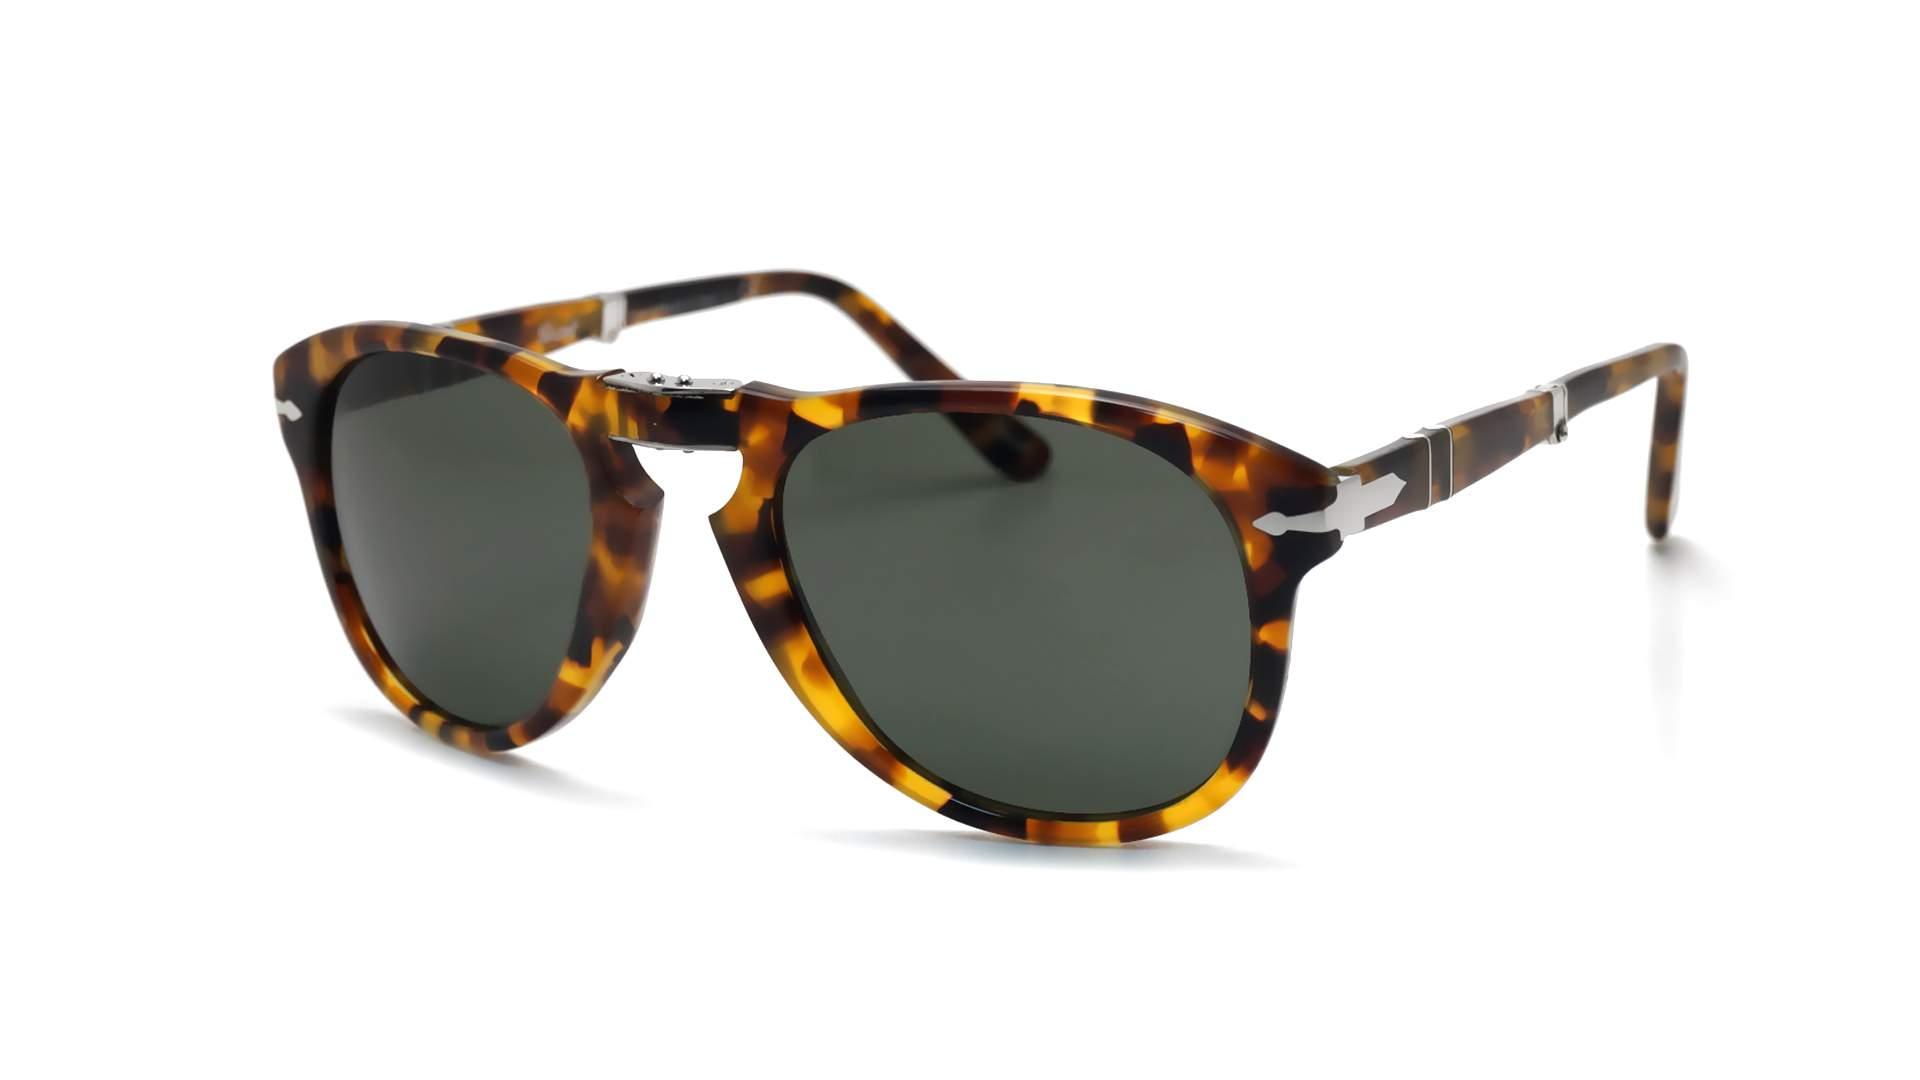 337e1a7b5f Sunglasses Persol 714 Gold Original Tortoise PO0714 1052 31 54-21 Large